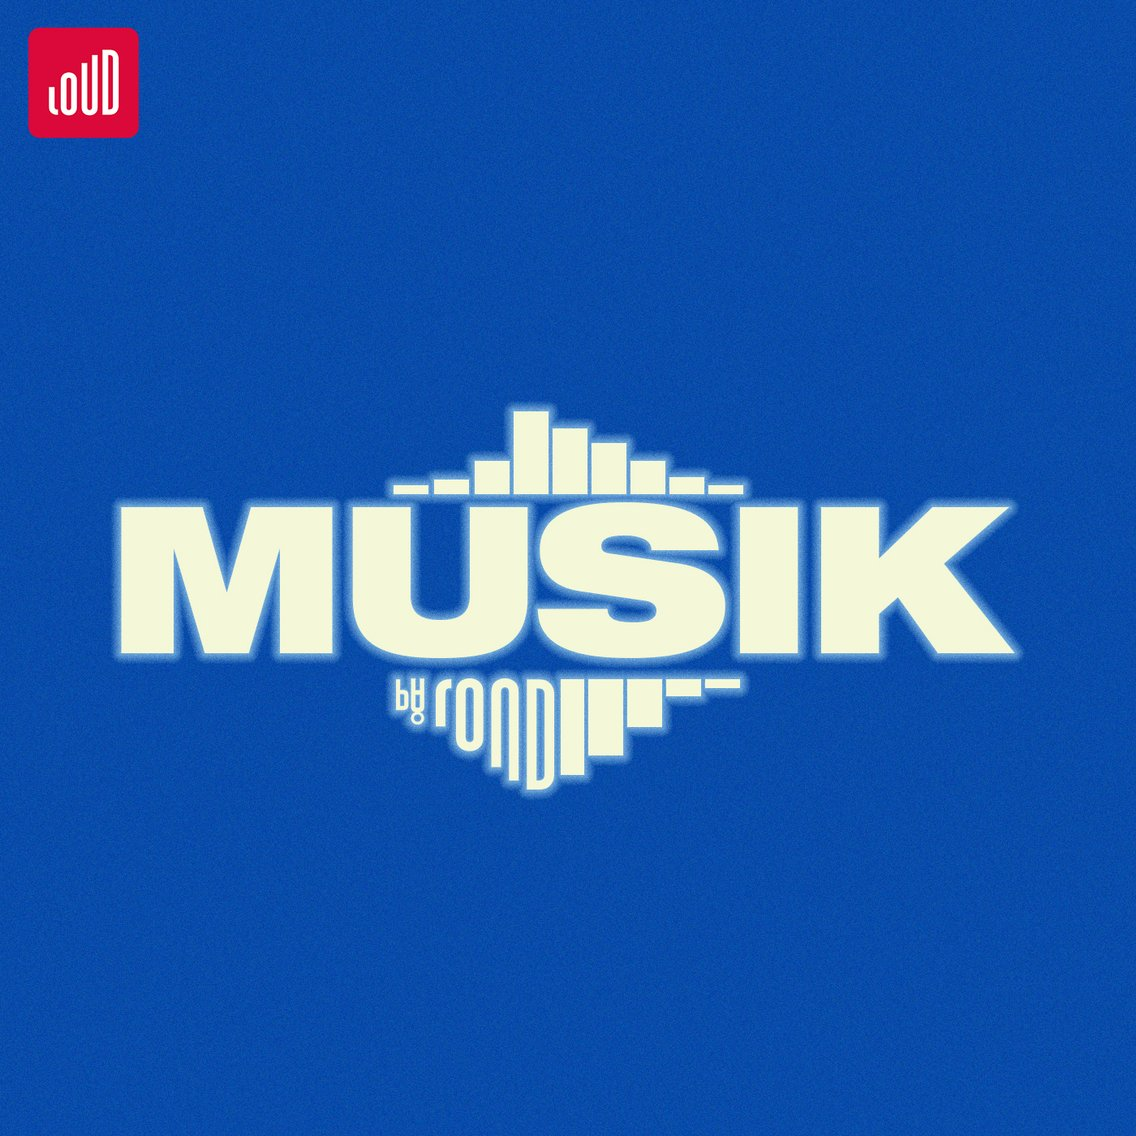 Musik på LOUD - immagine di copertina